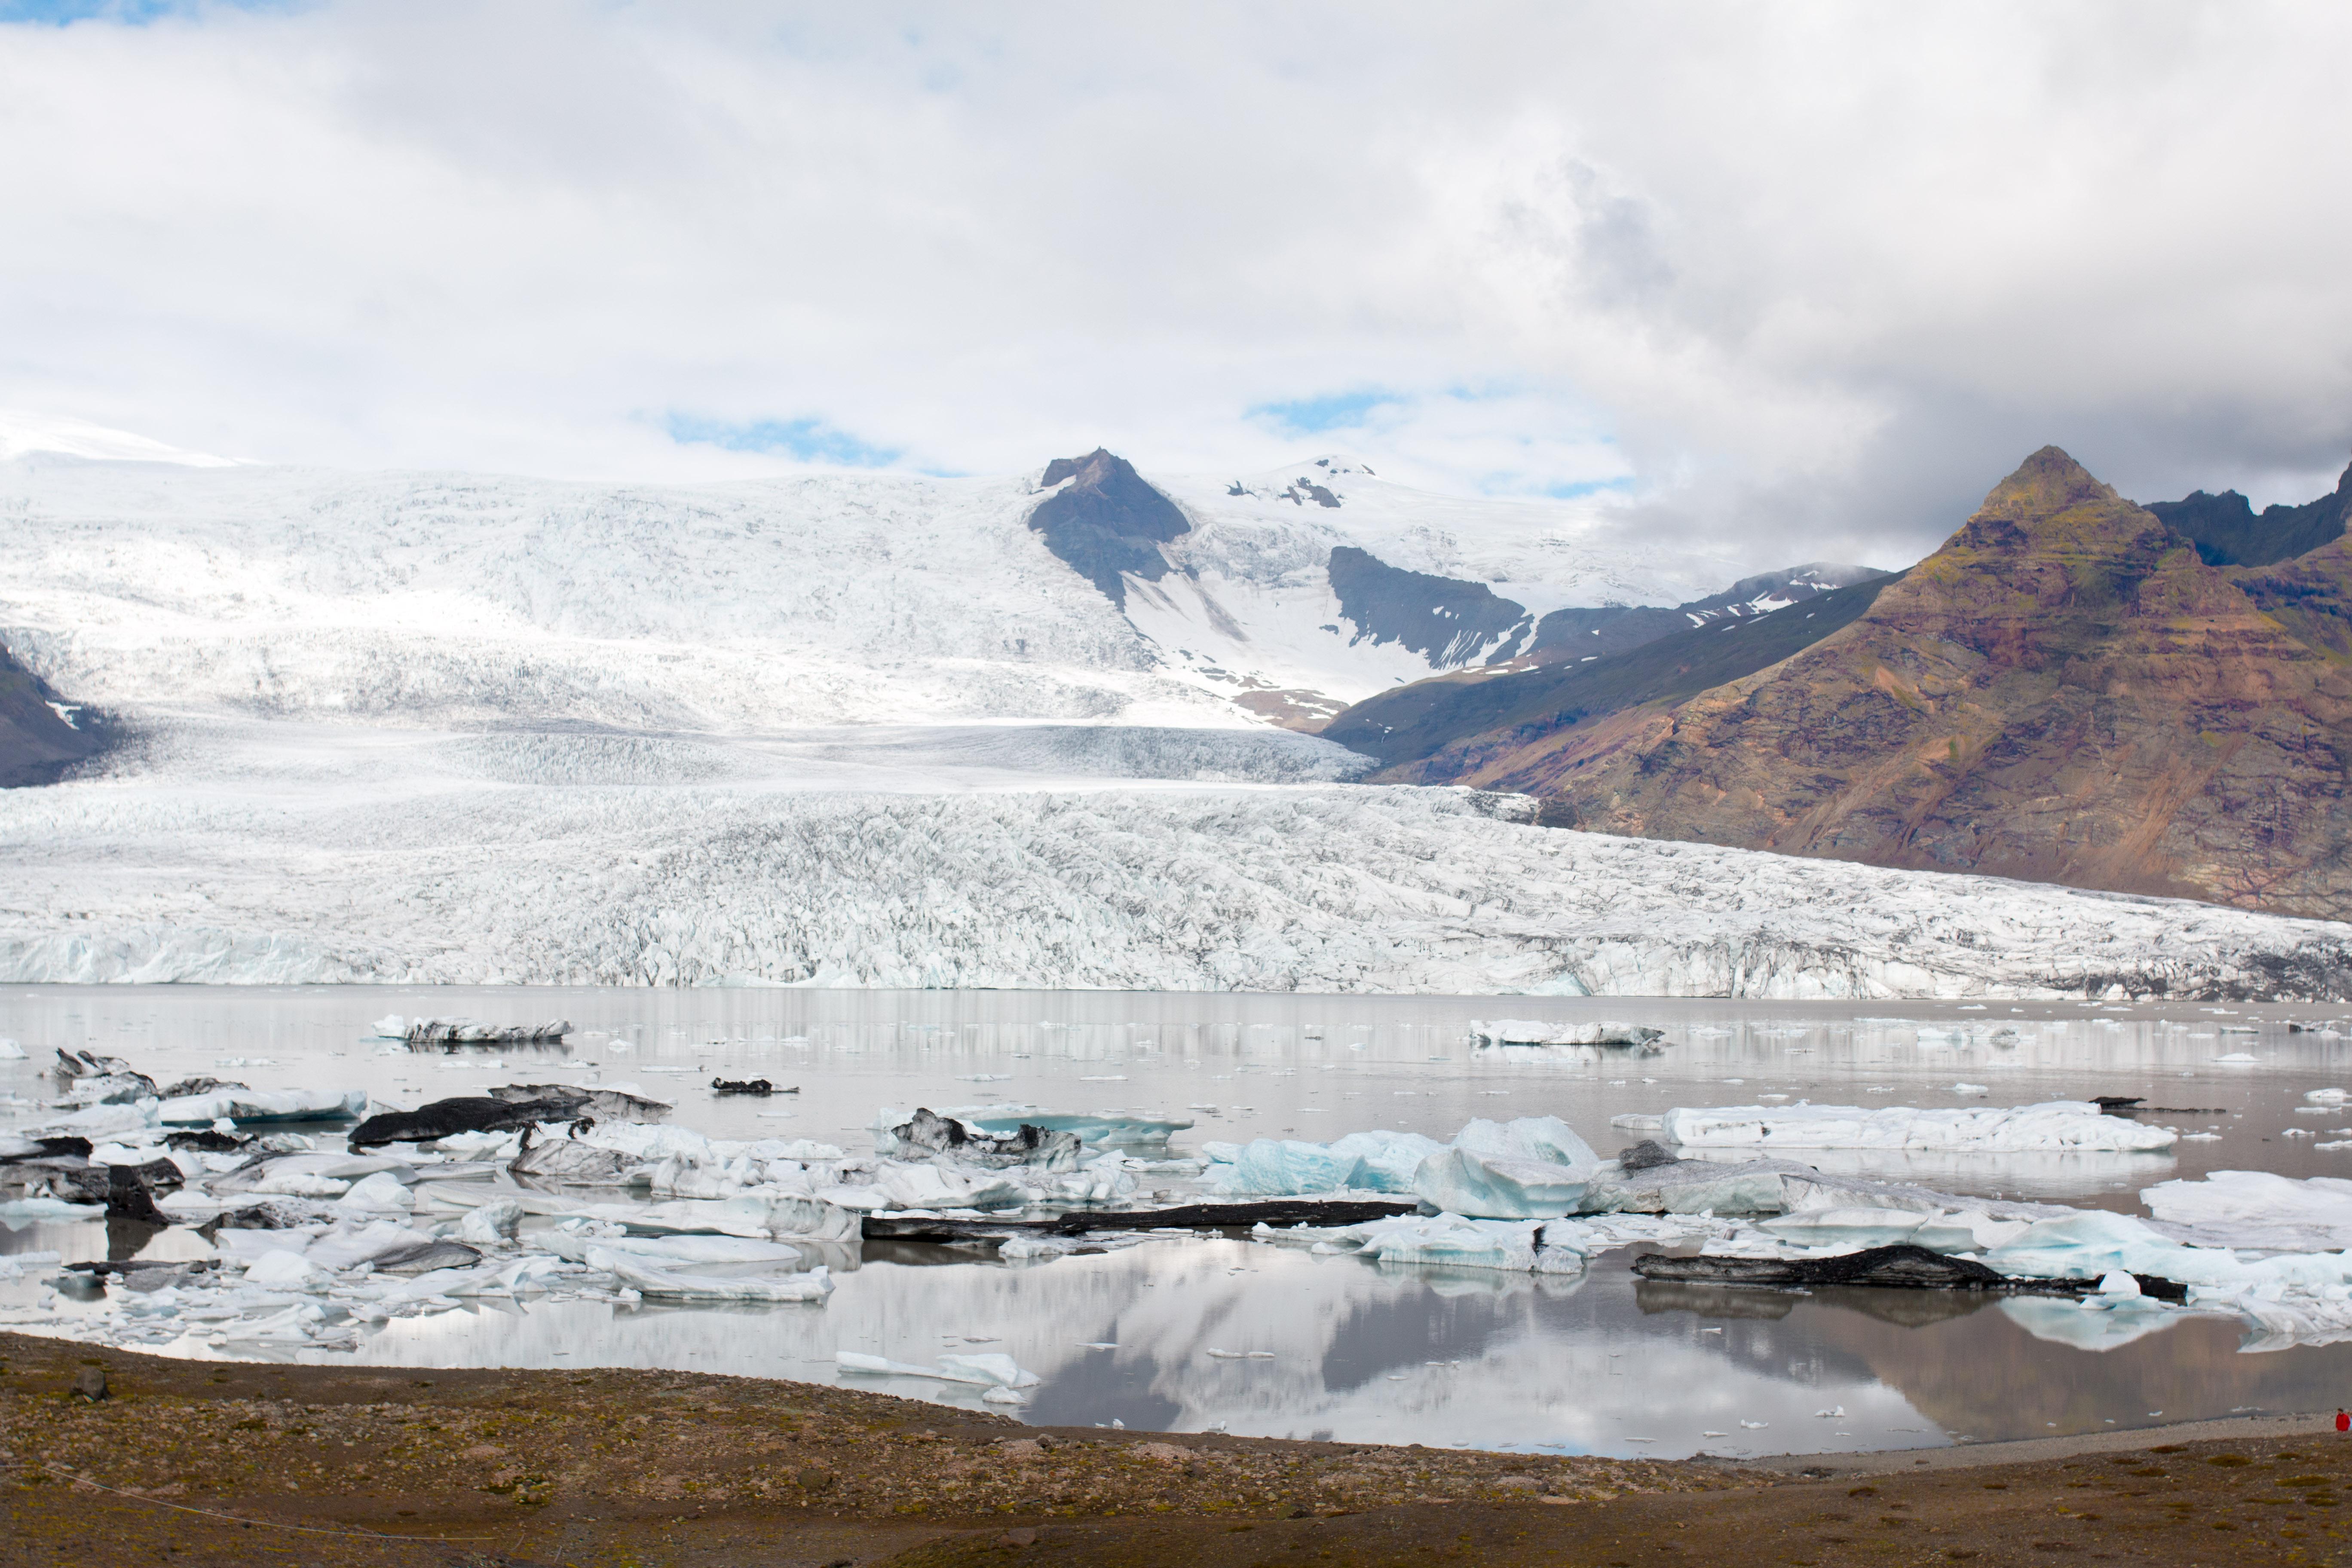 voyage en islande pendant 8 jours avec ma maman I Sp4nkblog_-29